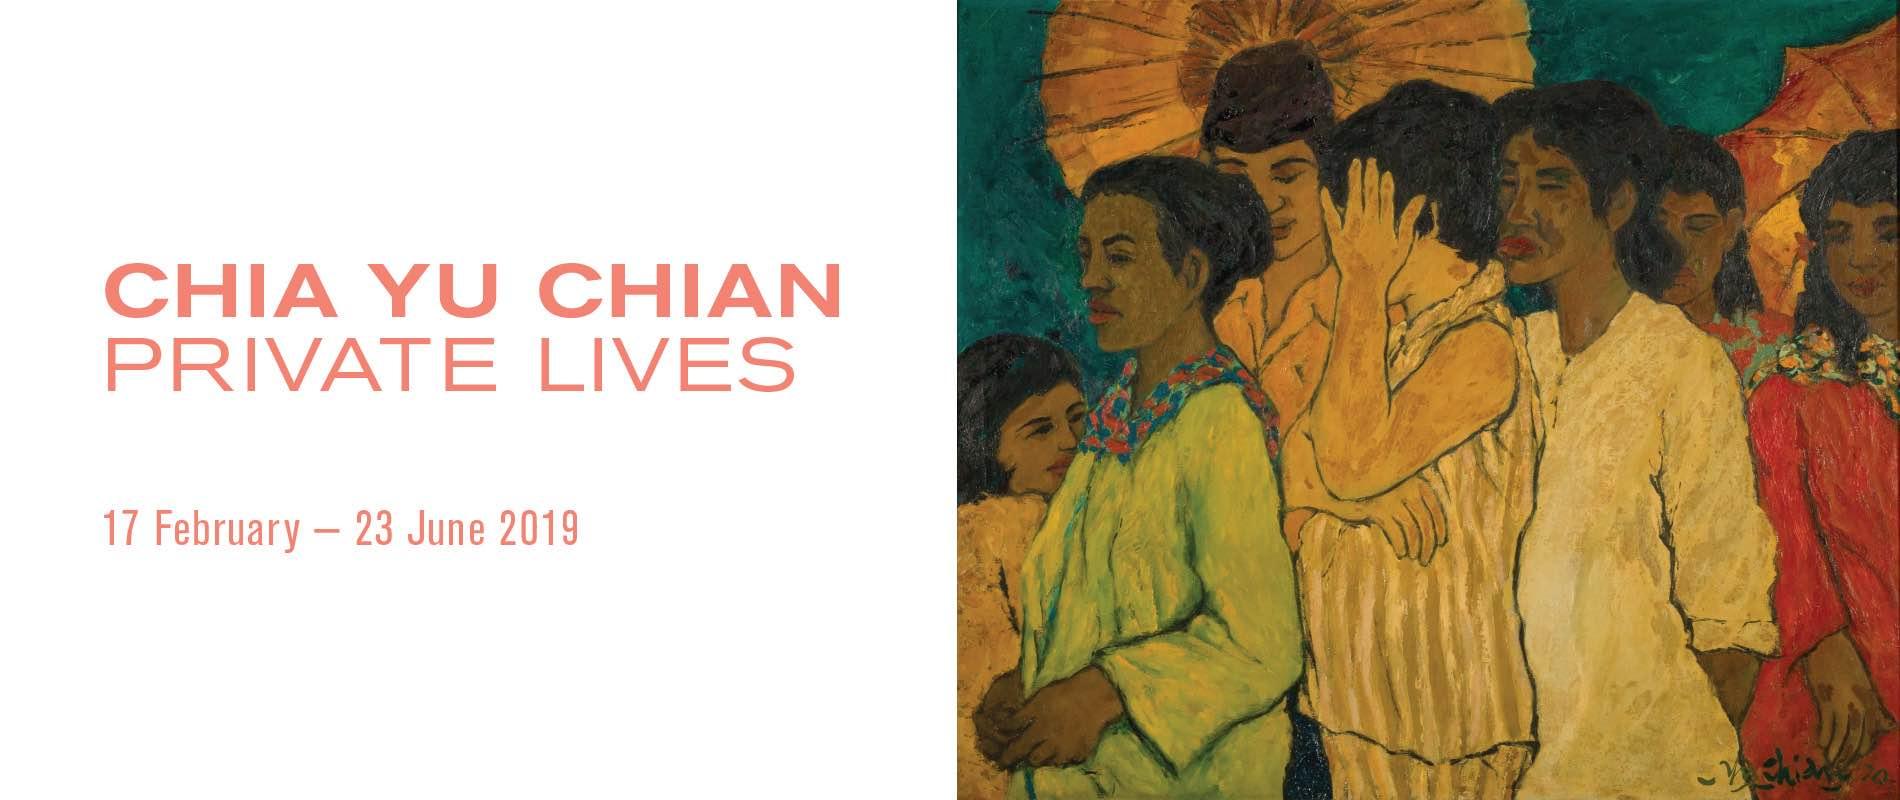 Chia Yu Chian: Private Lives